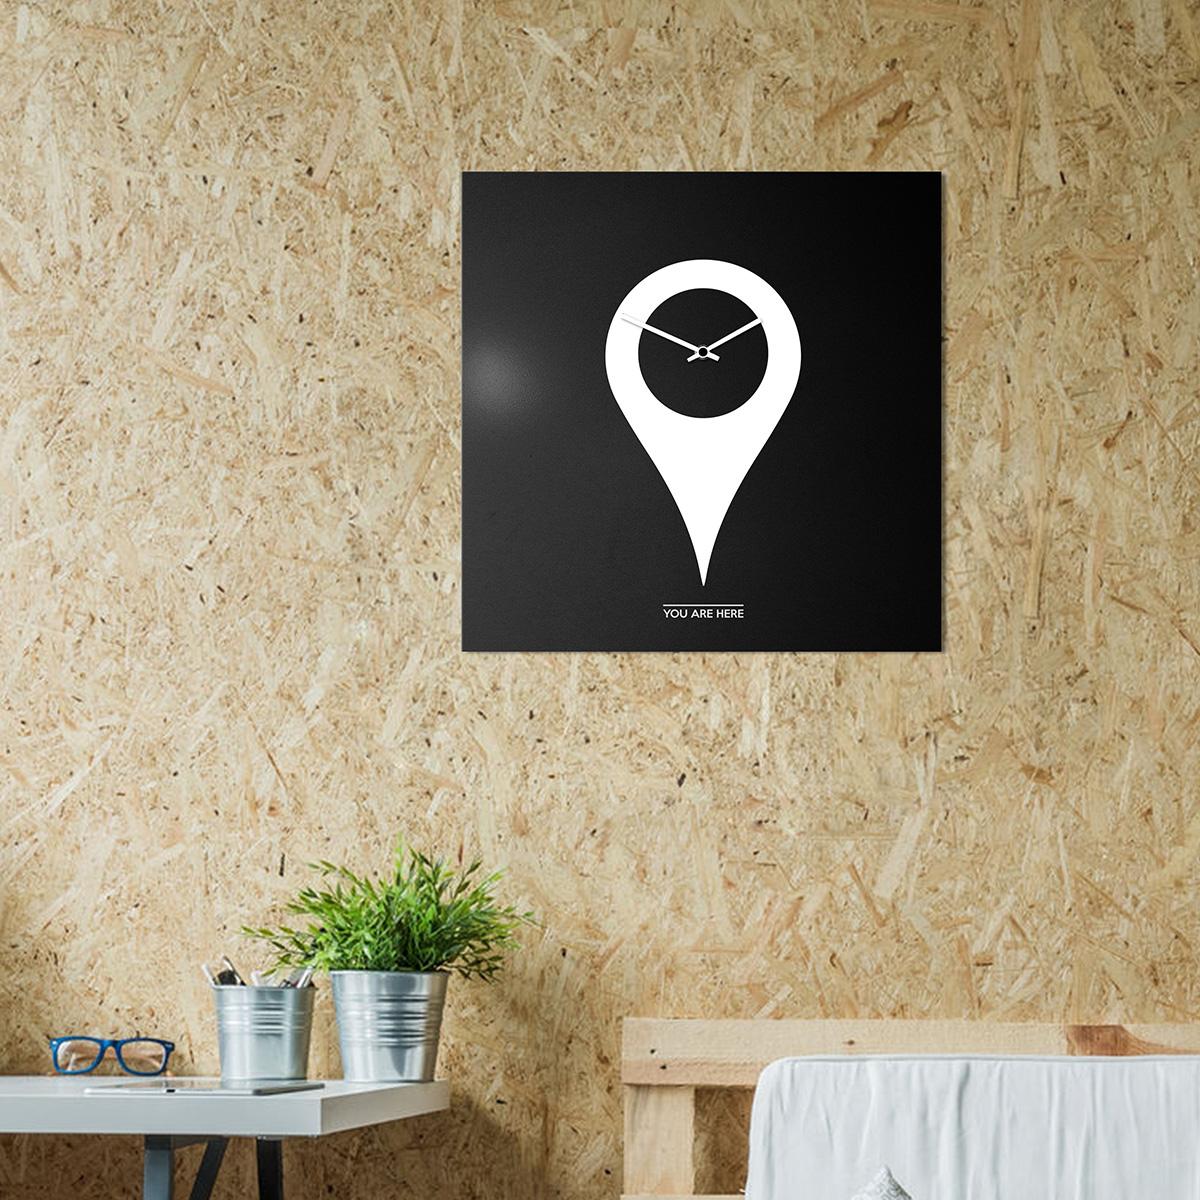 orologio-parete-minimal-design-wall-clock-youarehere-black-white-mood